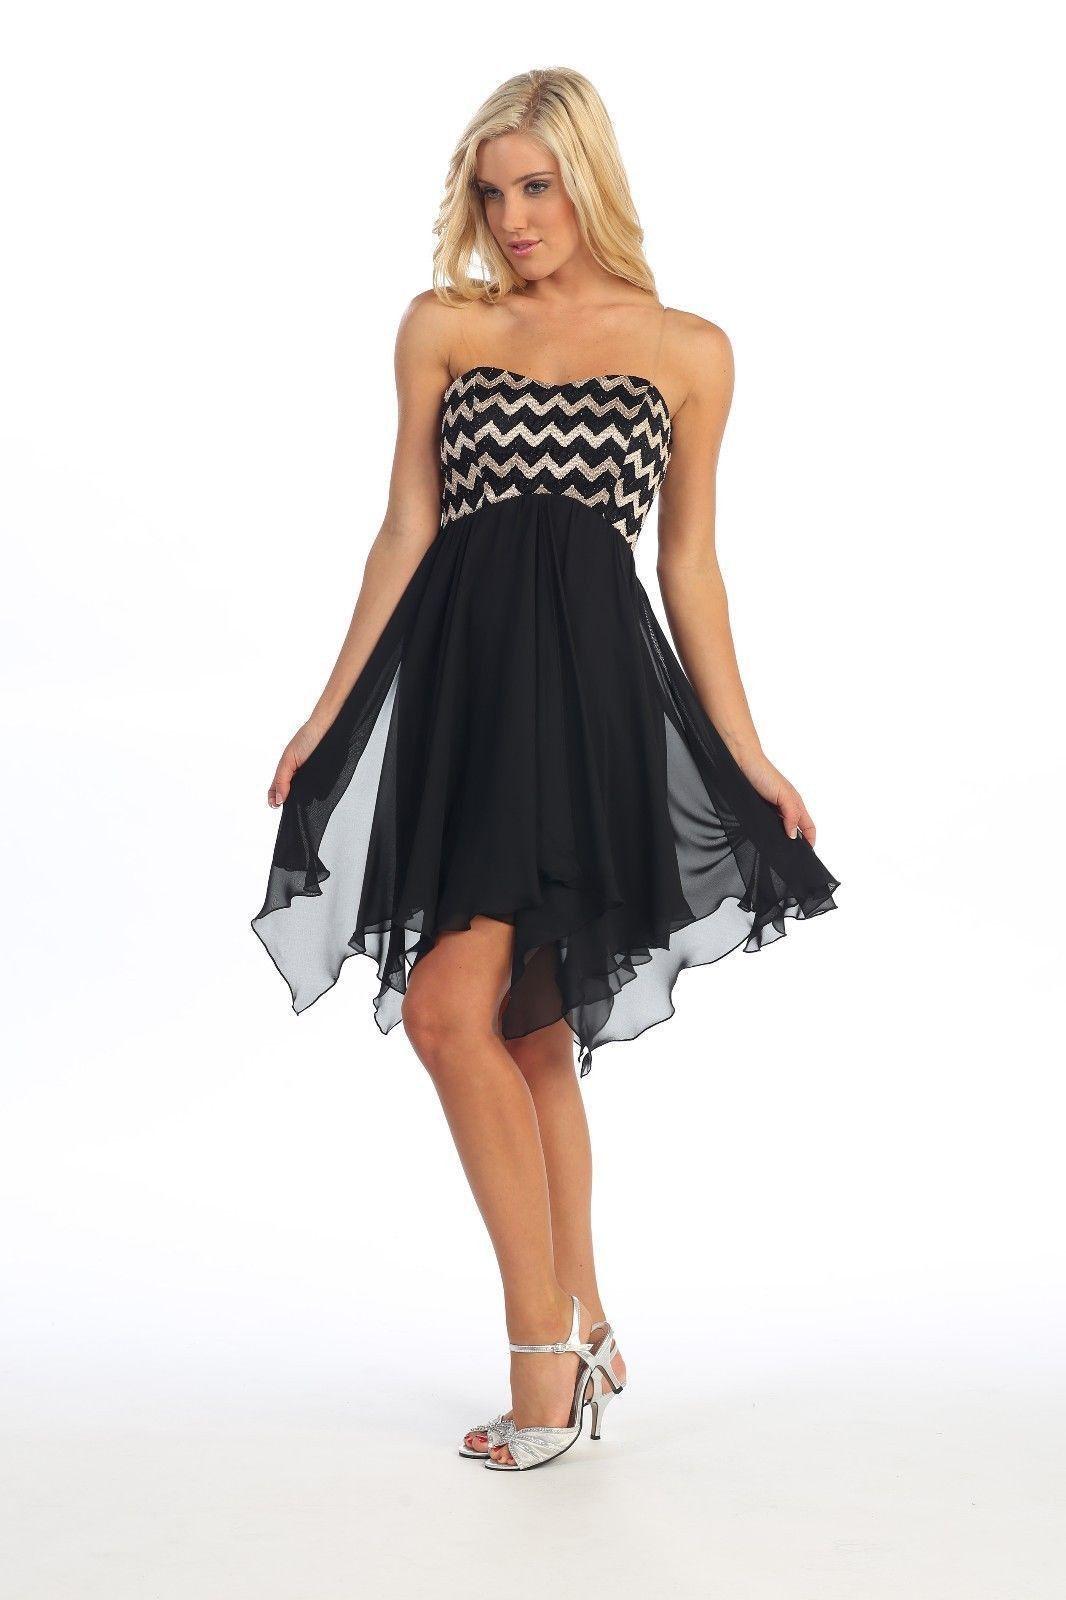 Strapless chiffon cocktail dress empire waist formal glittering